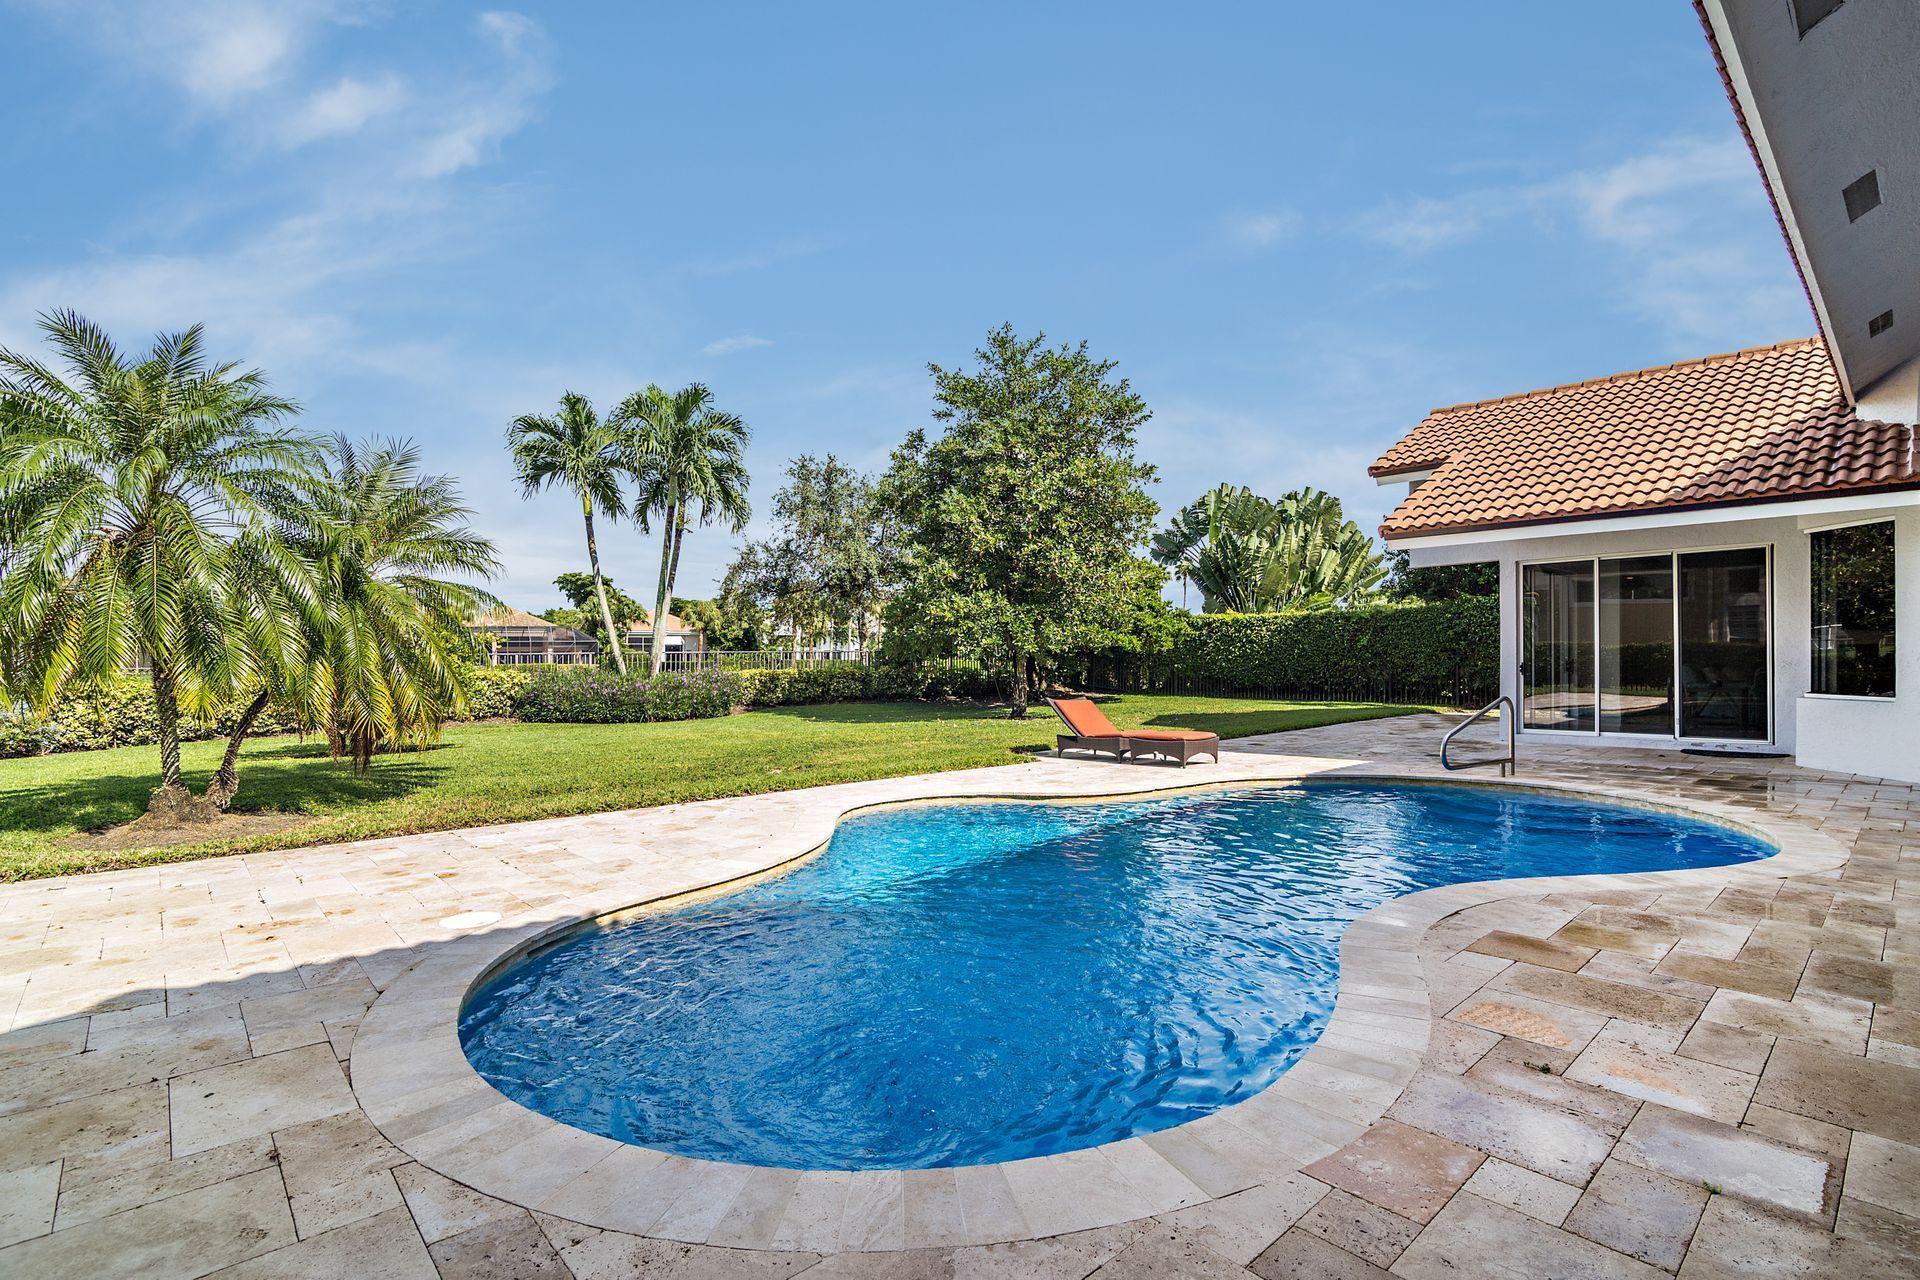 44 St James Street, Palm Beach Gardens, Florida 33418, 3 Bedrooms Bedrooms, ,3 BathroomsBathrooms,F,Single family,St James,RX-10606460